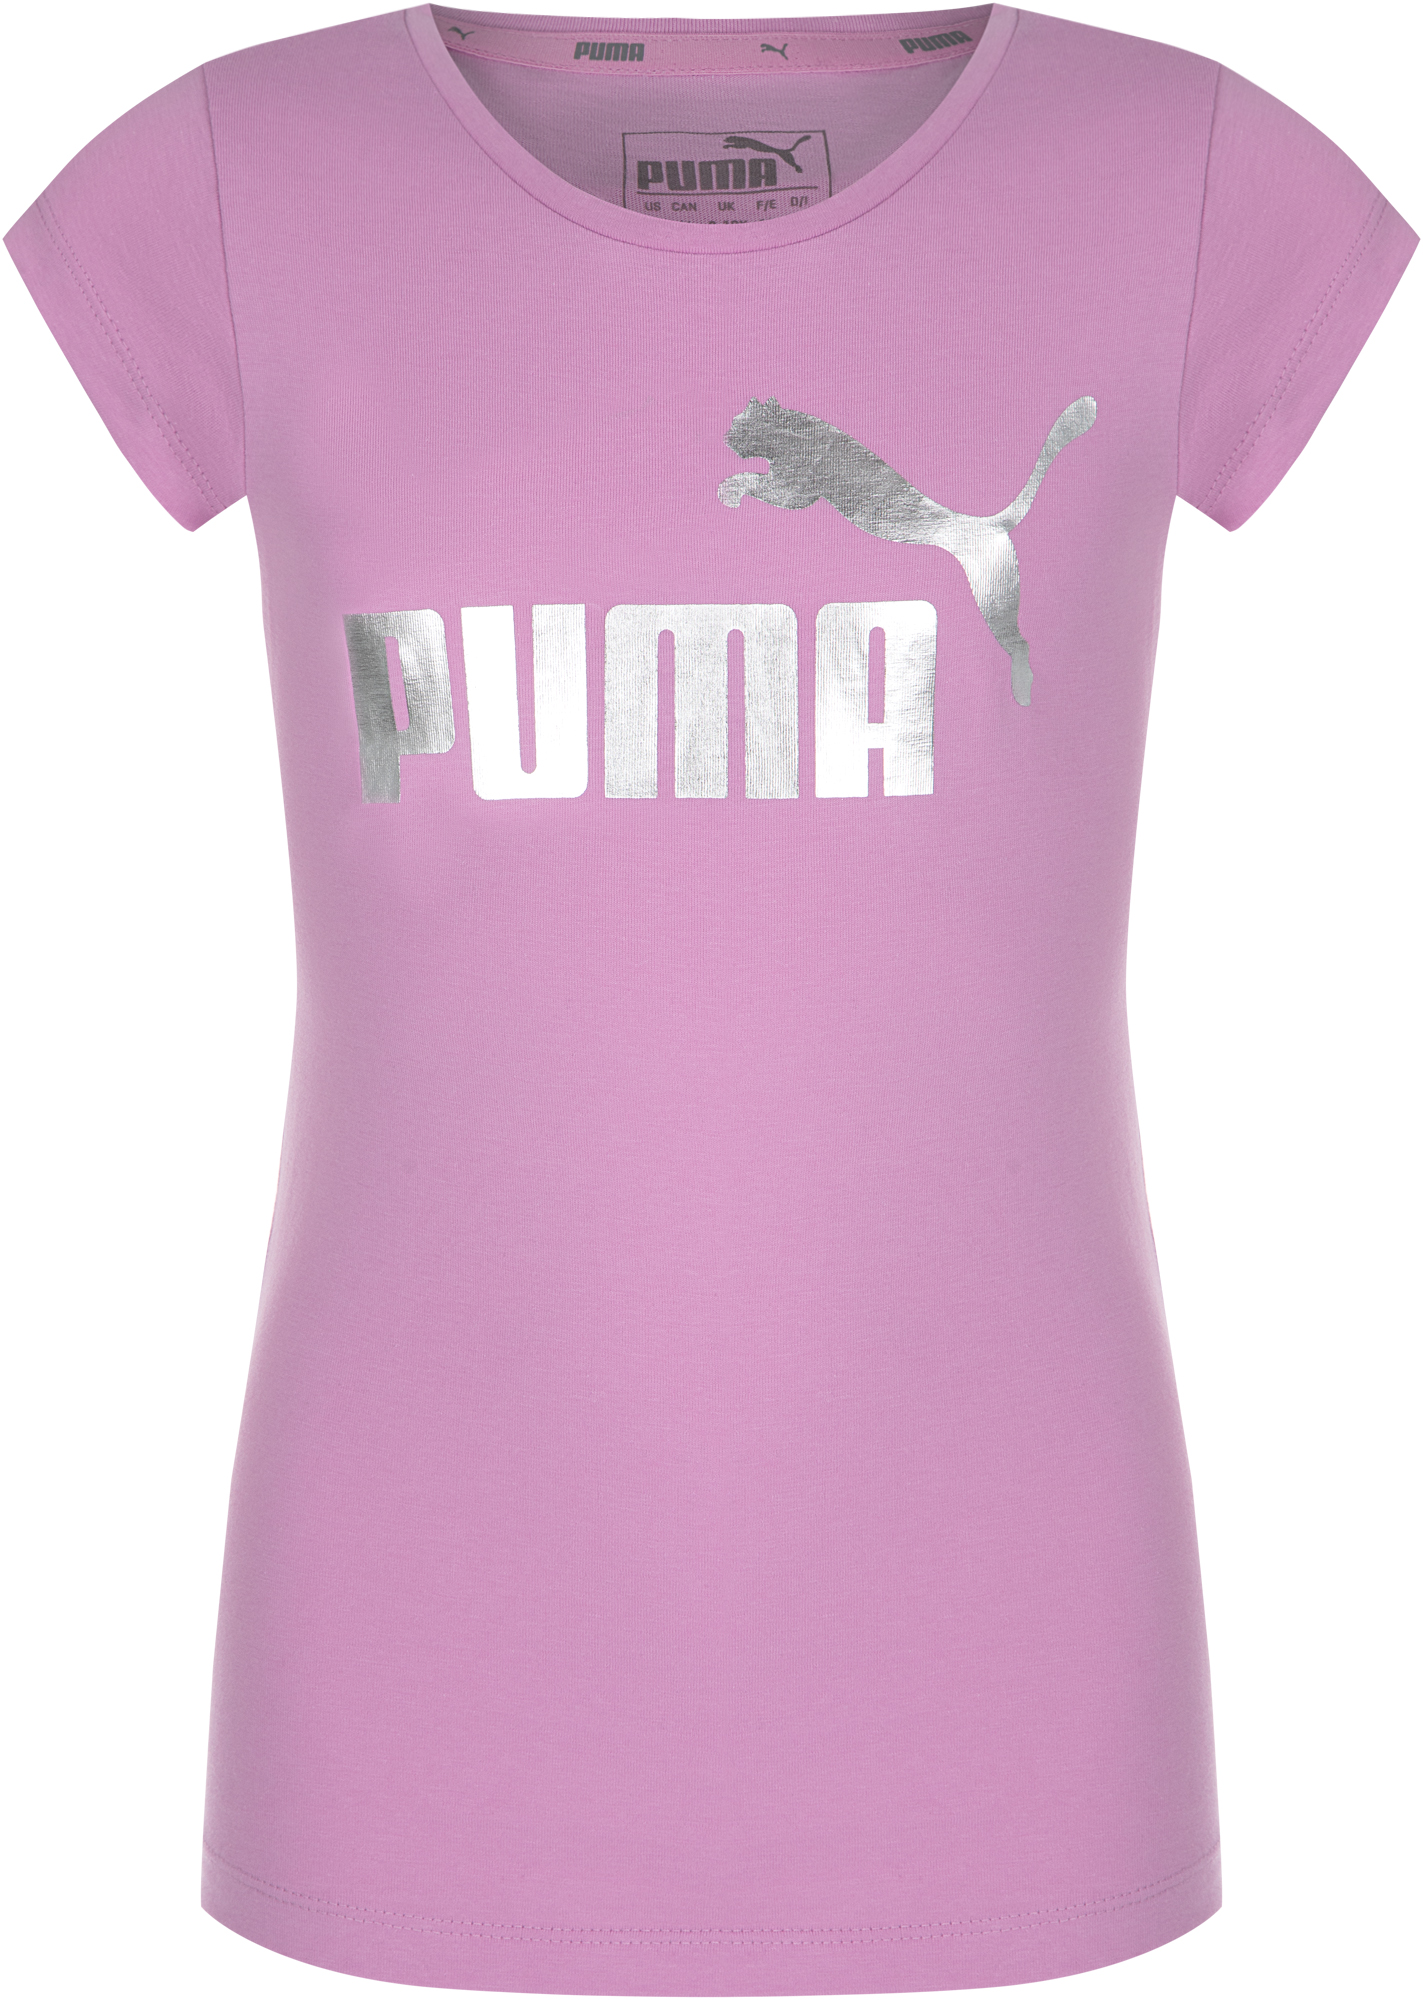 Puma Футболка для девочек Puma Girls Glitter Tee, размер 164 цена 2017